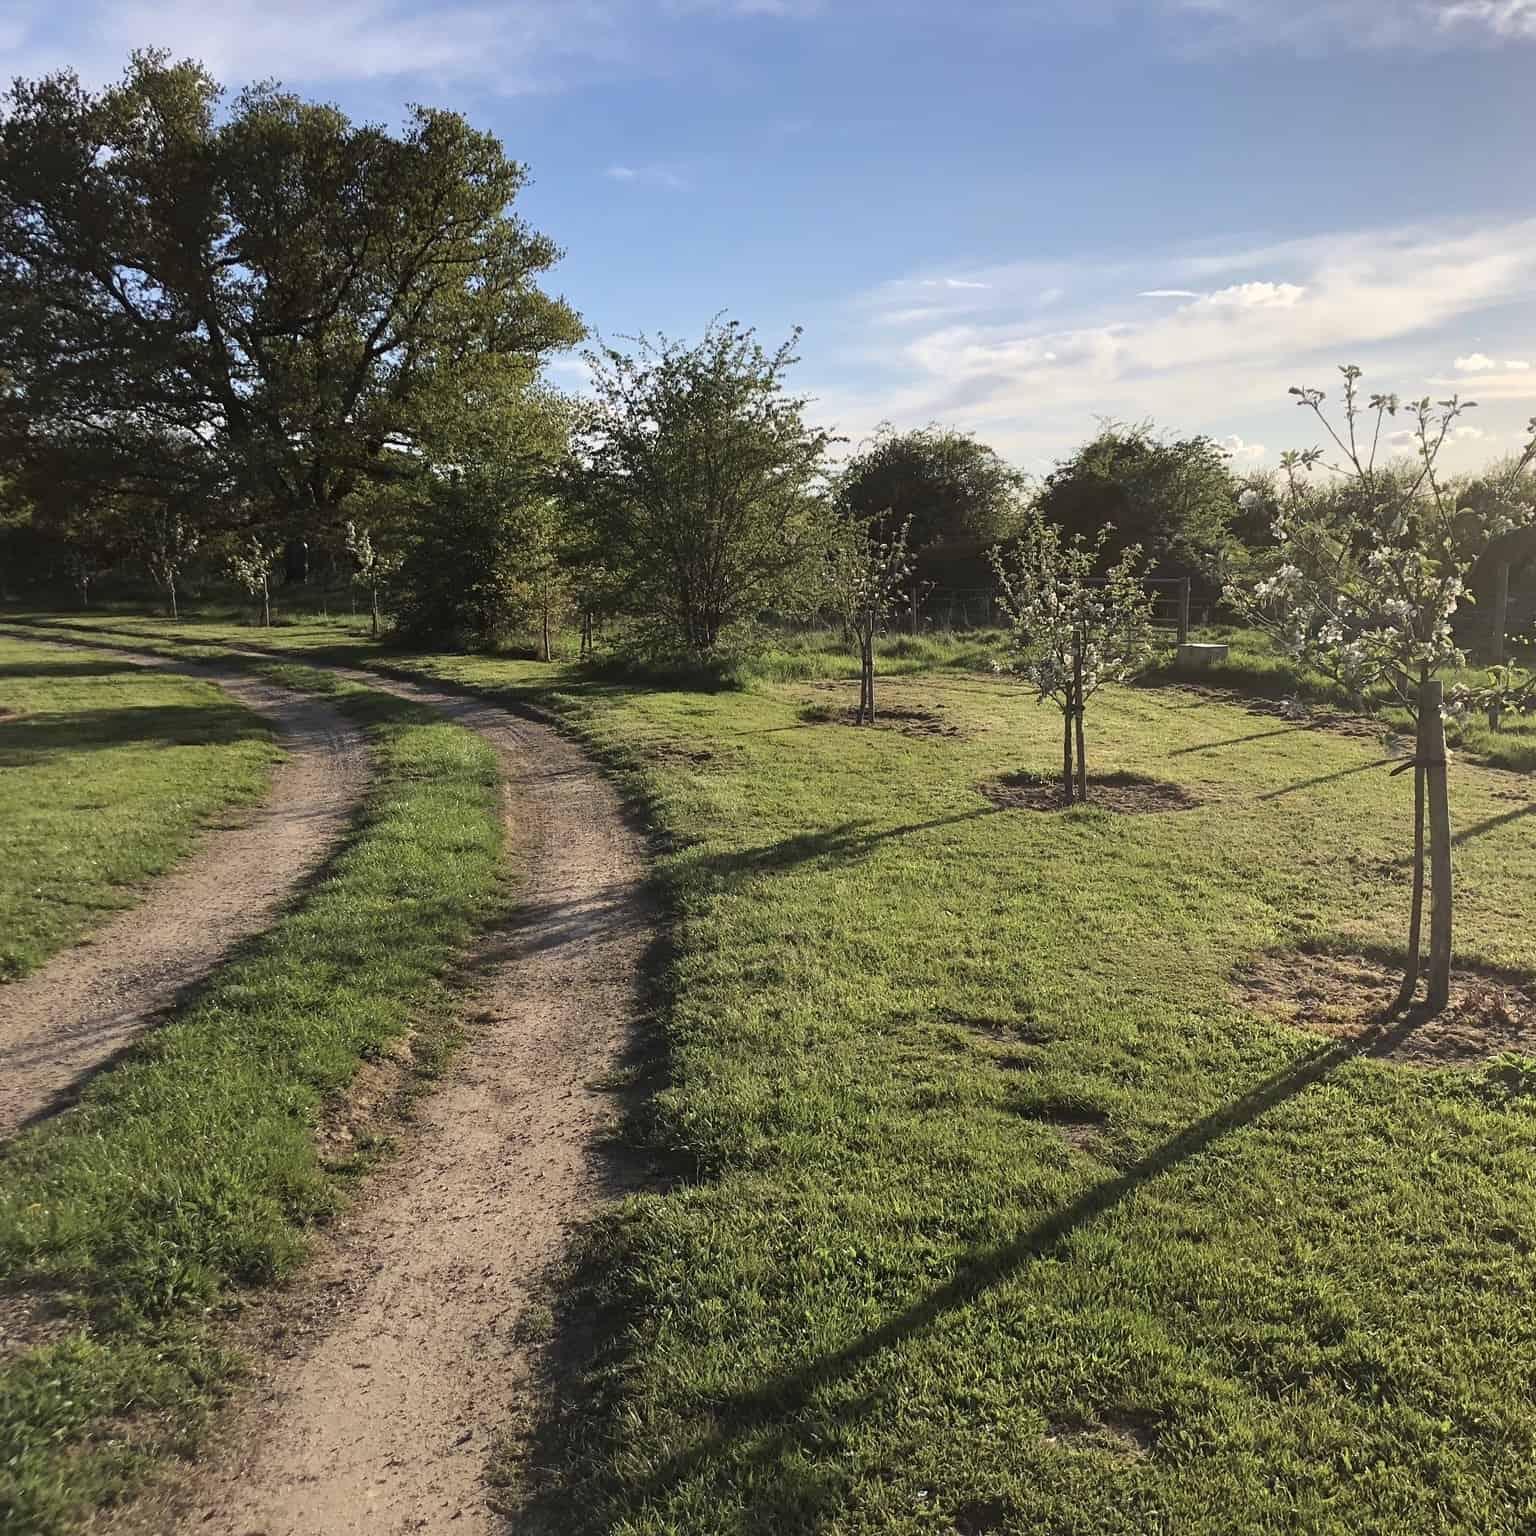 gooseberry field entrance track